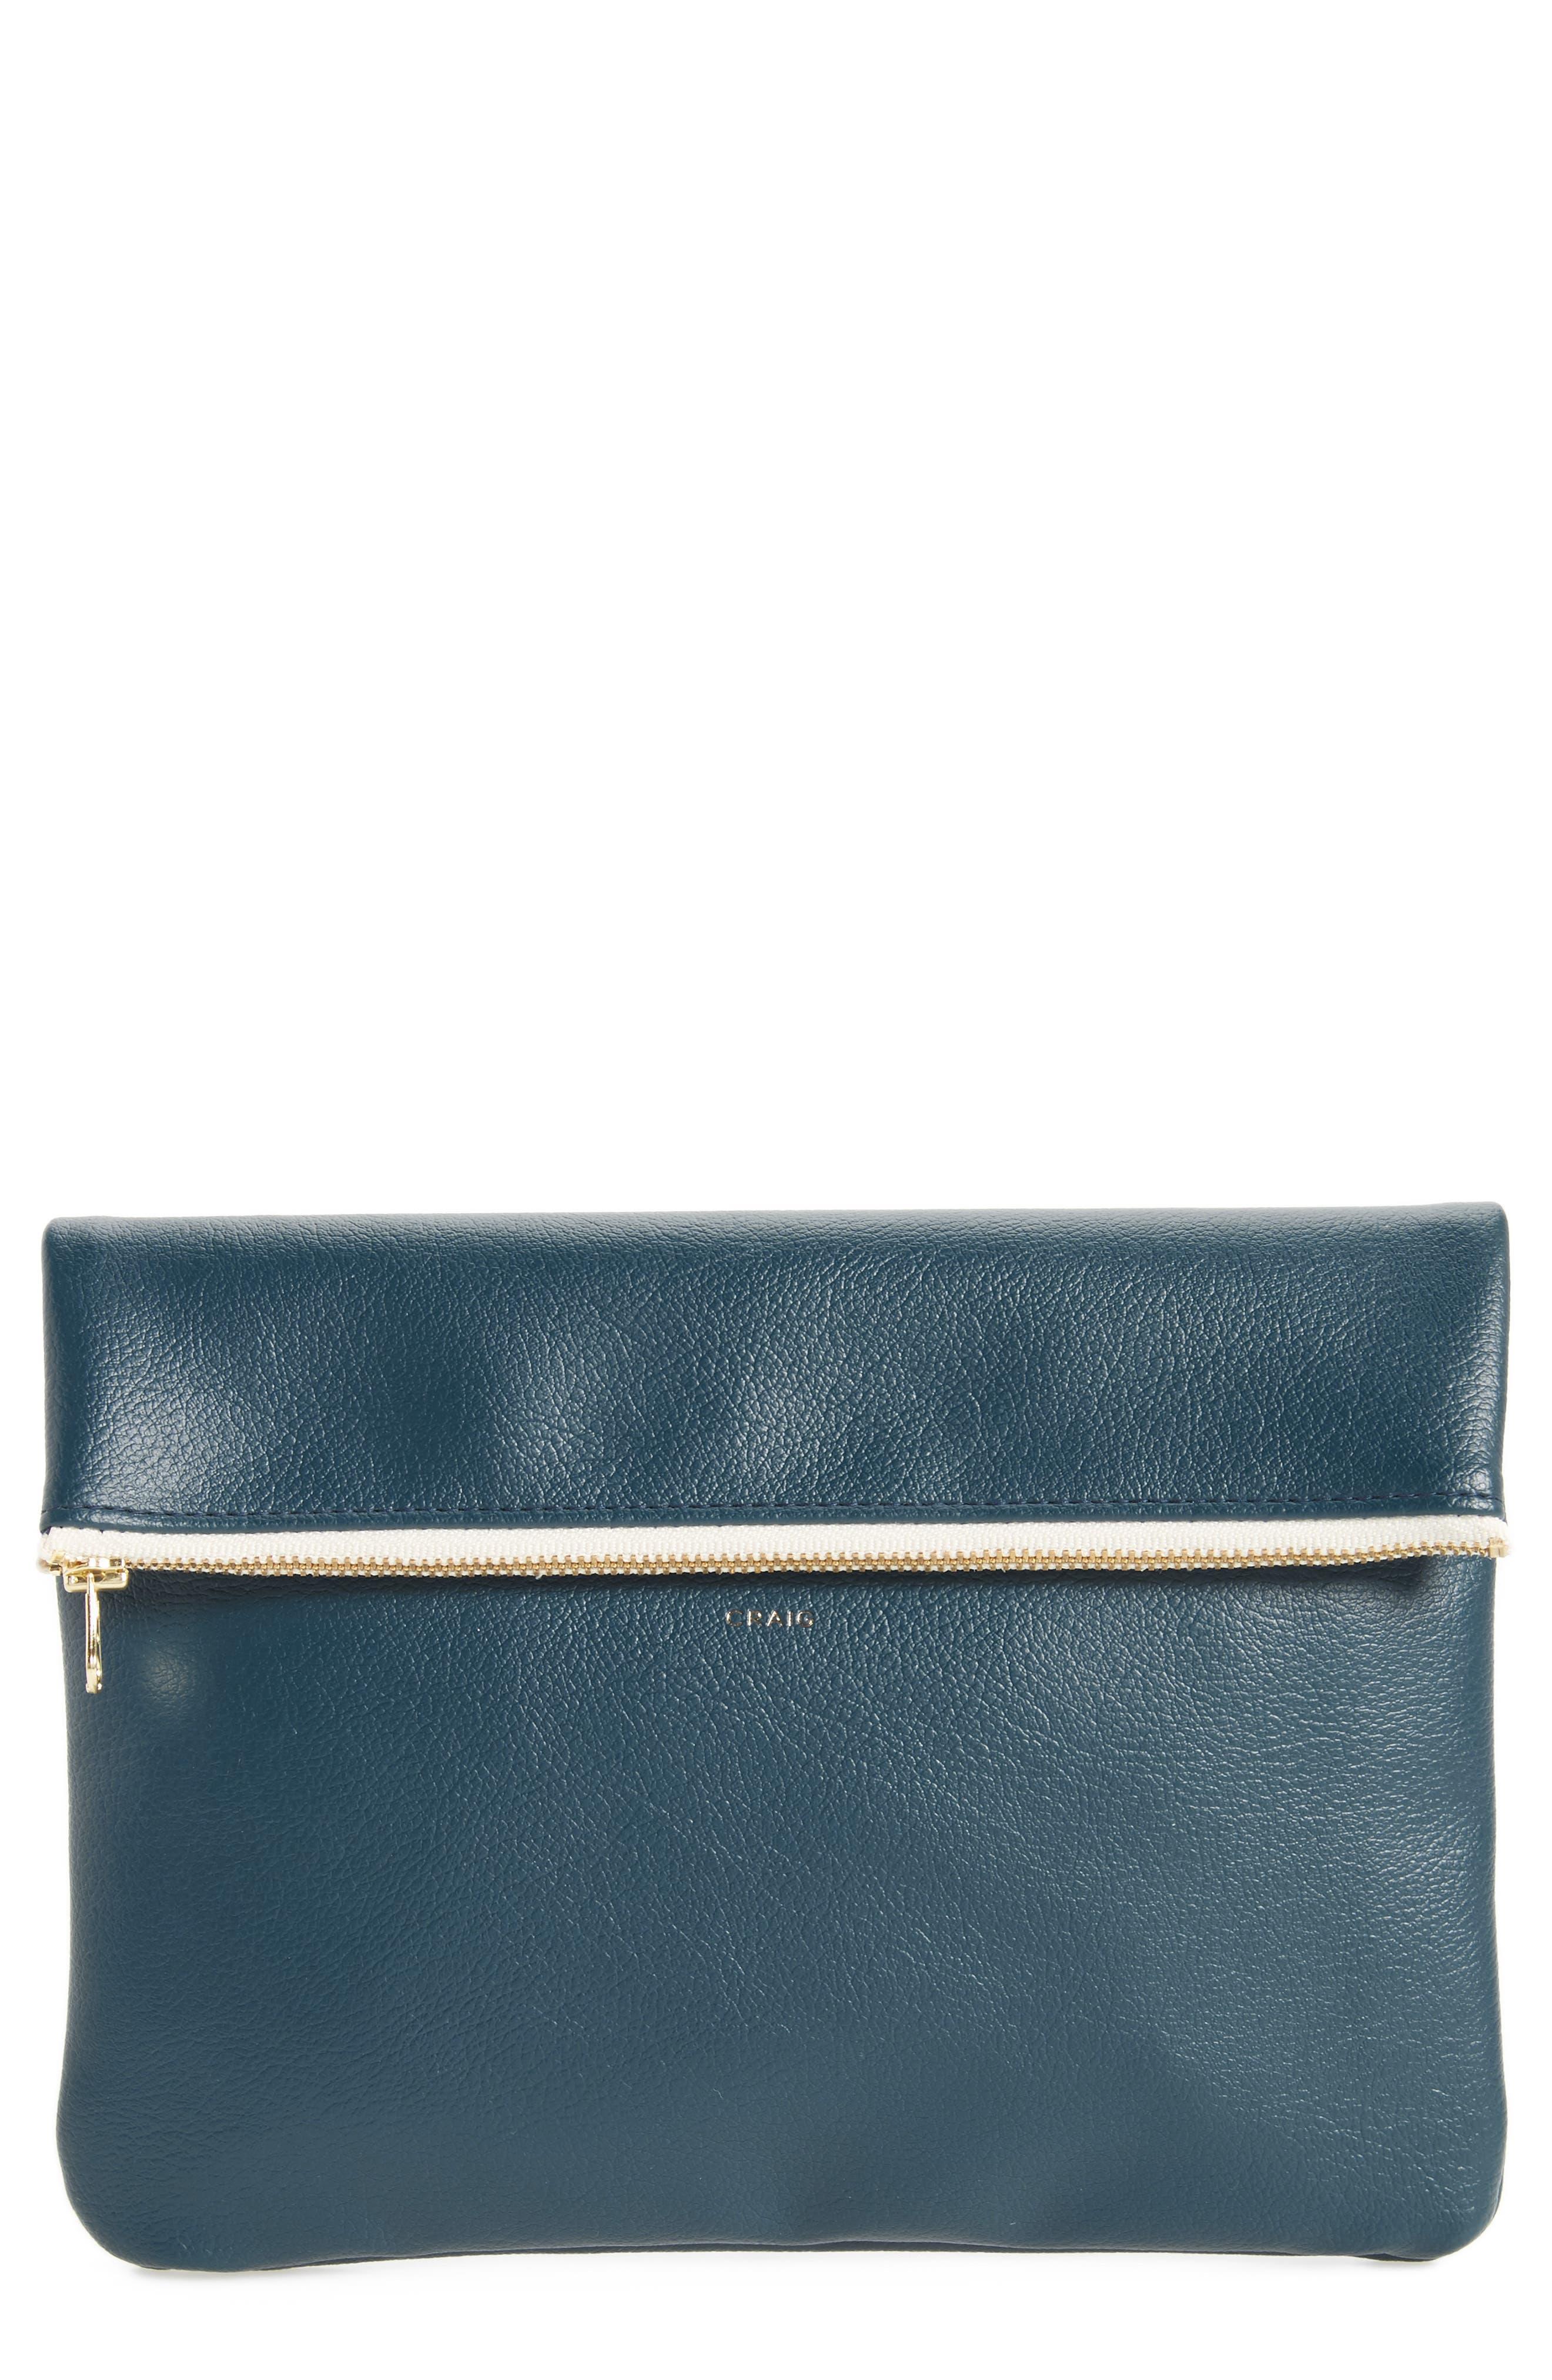 Craig Medium Faux Leather Clutch,                         Main,                         color, Dark Blue